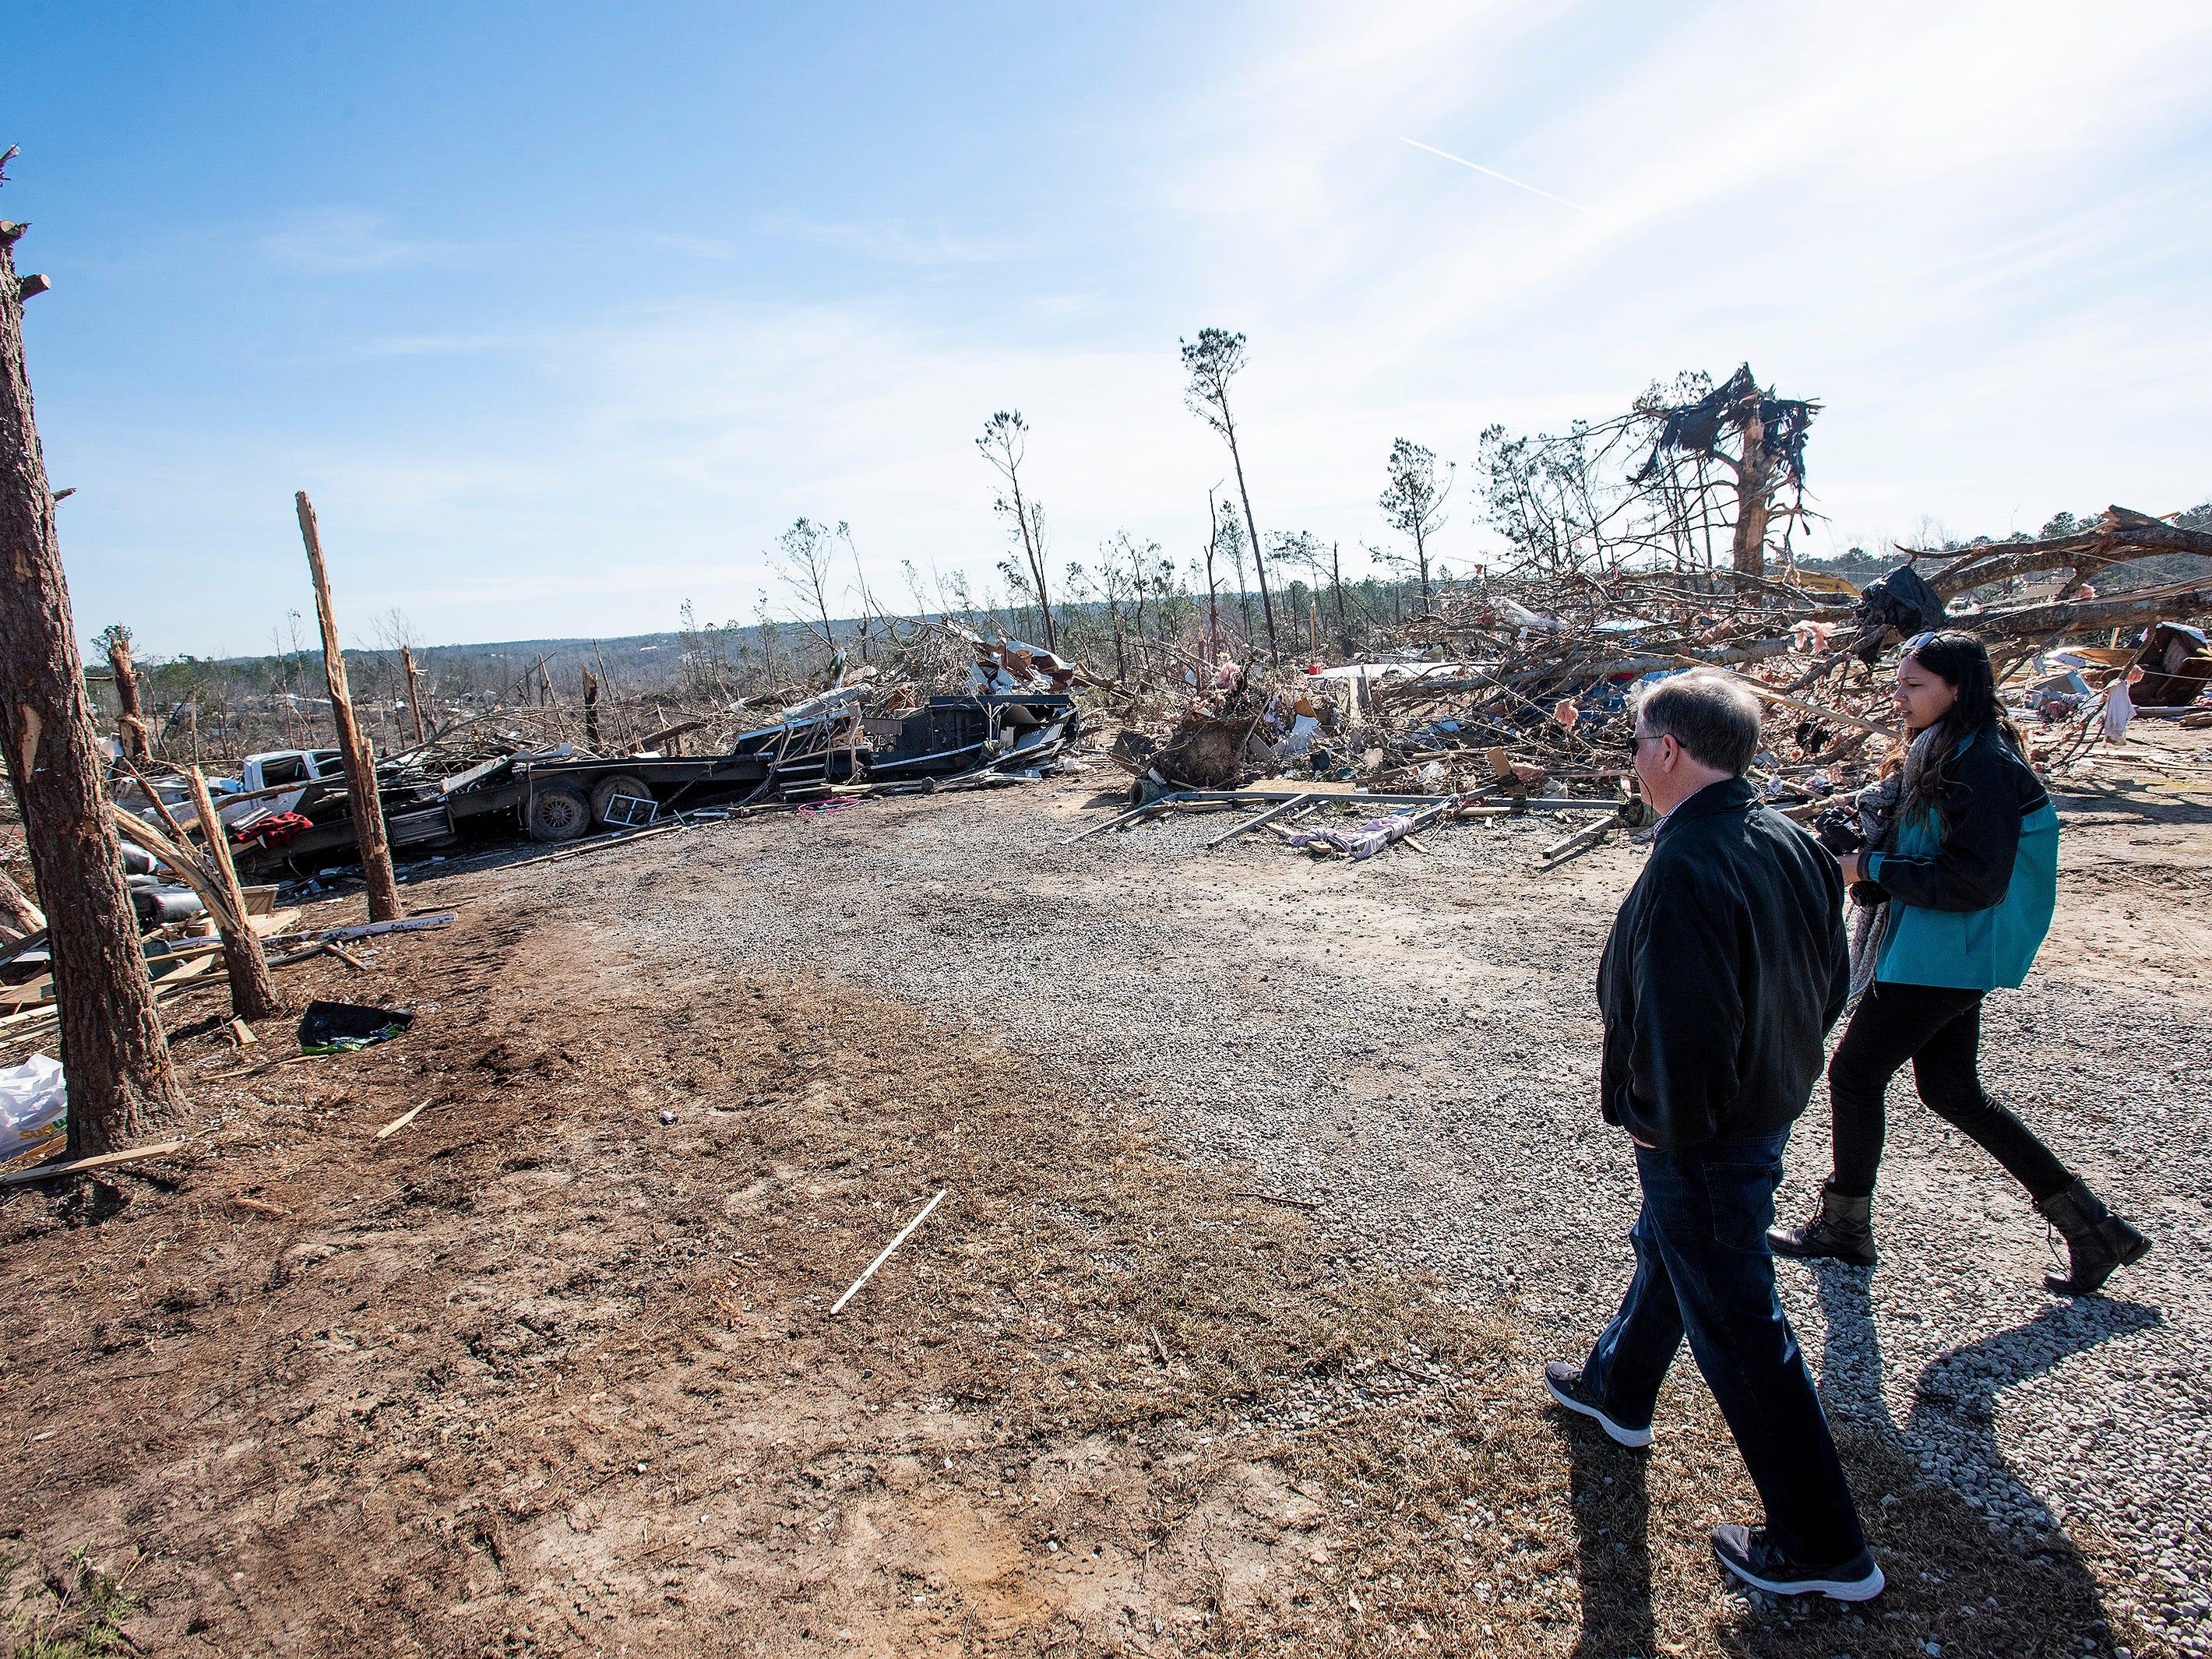 Sen. Doug Jones, D-Ala., tours the tornado damaged area in Beauregard, Ala., on Thursday March 7, 2019.